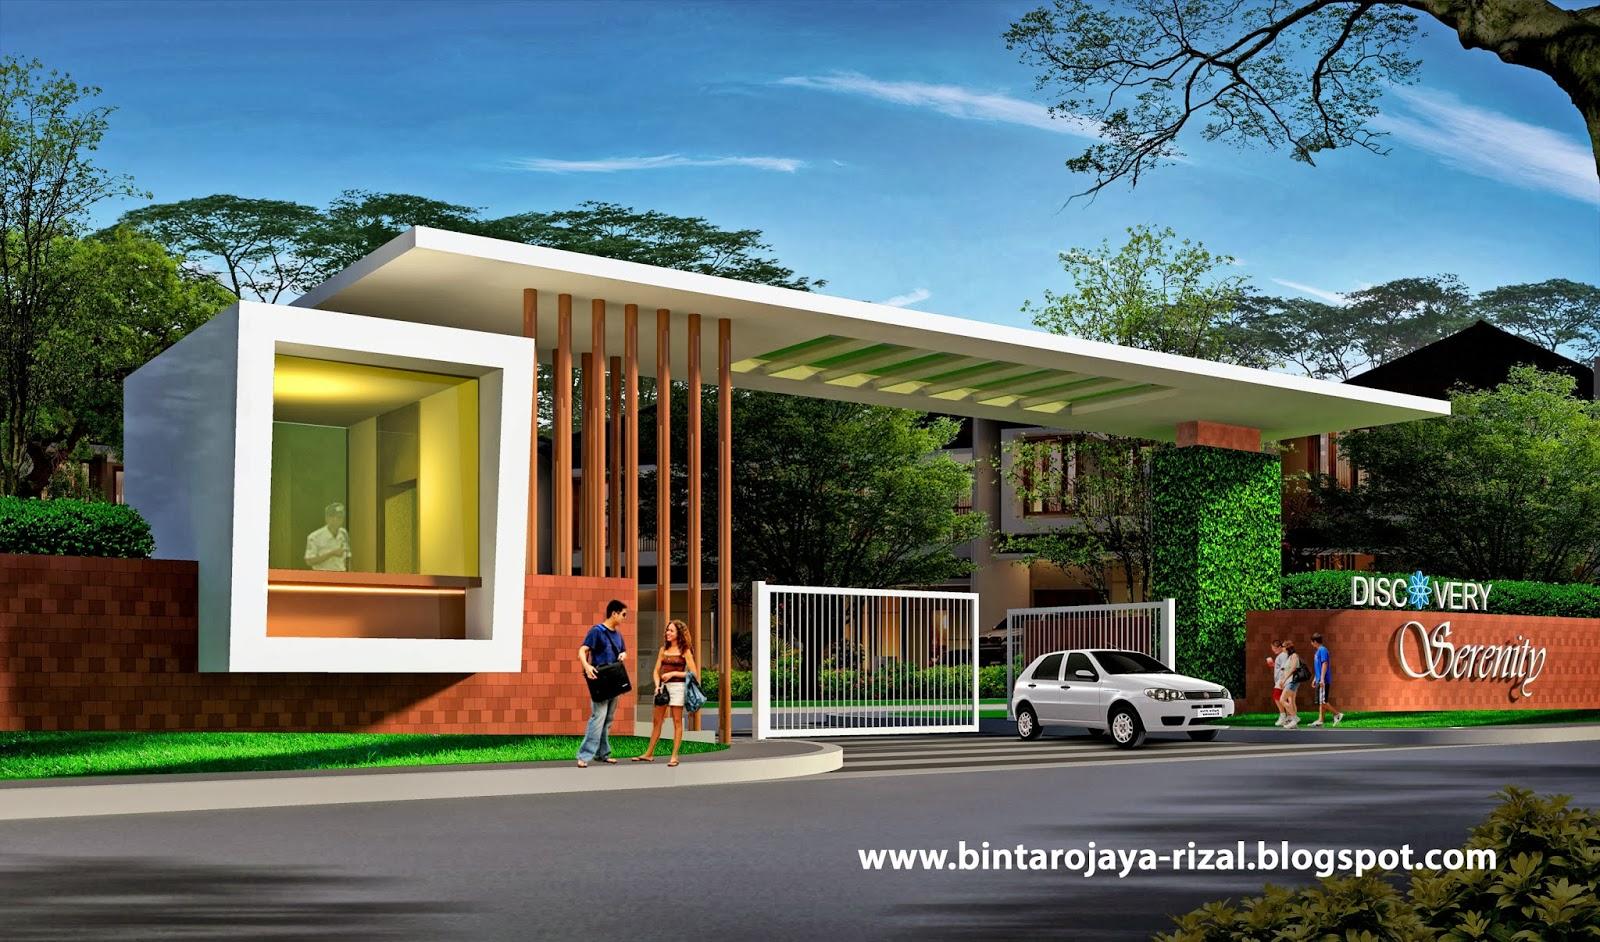 Bintaro Jaya: Bintaro Jaya coming soon new premium cluster